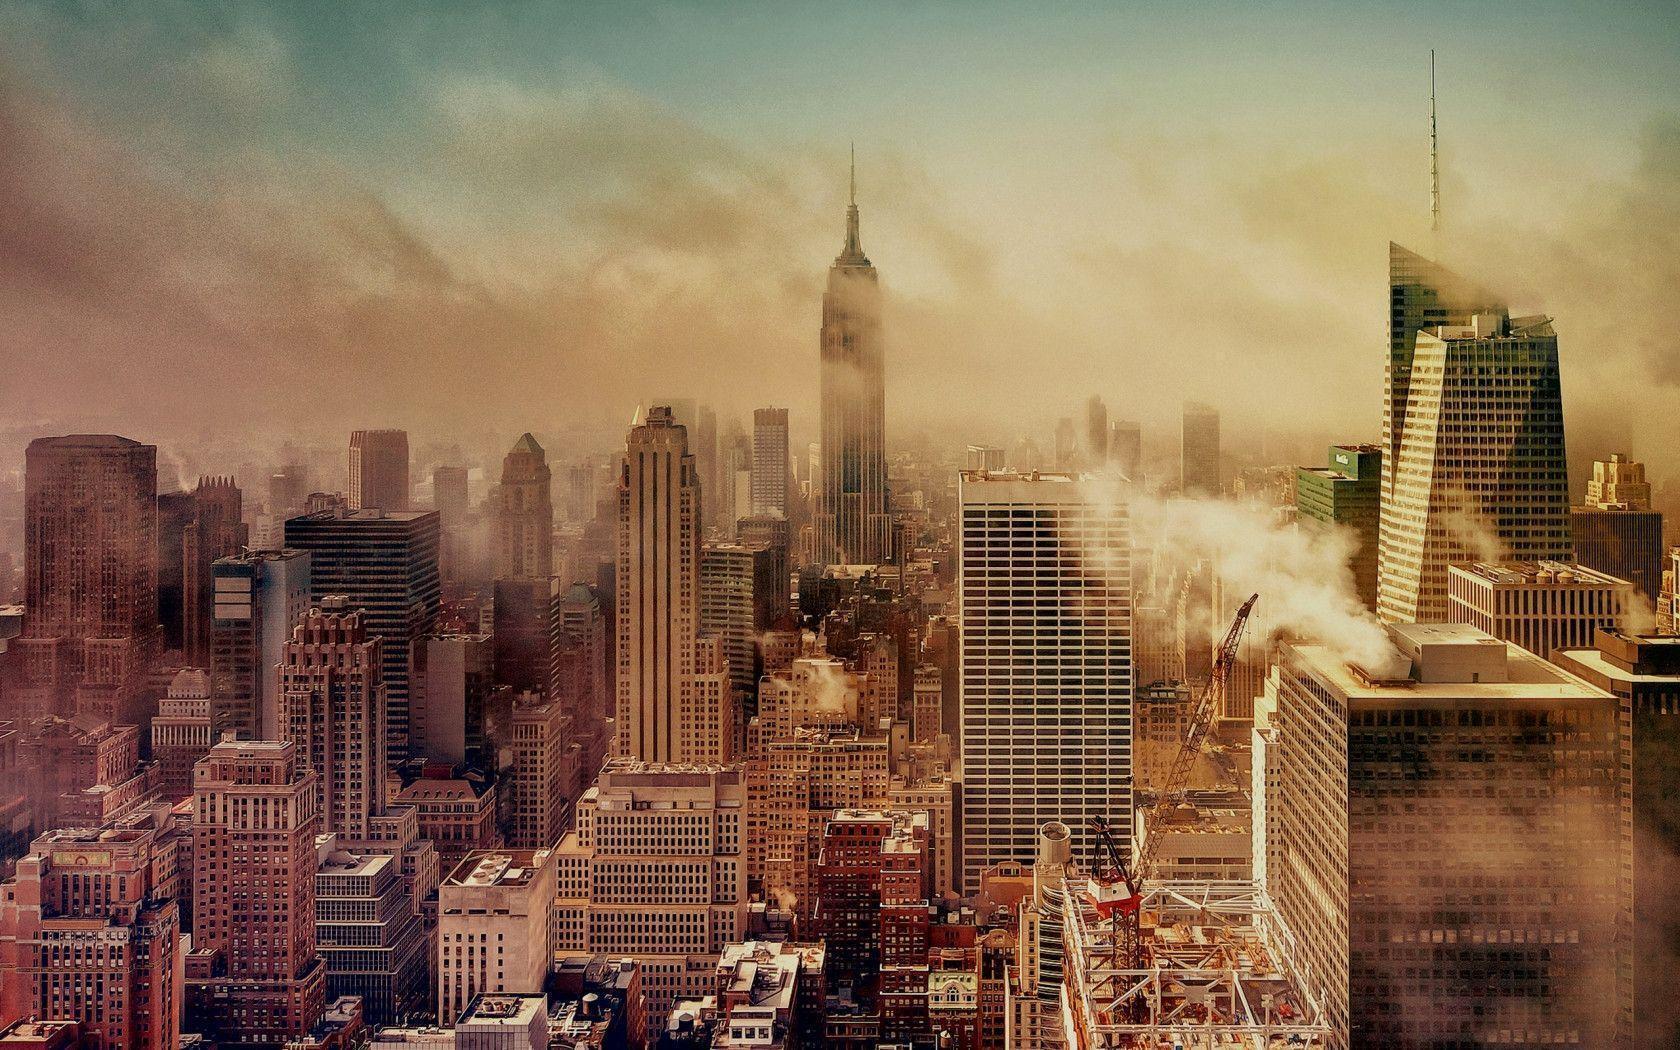 New York City Postcard Wallpaper City